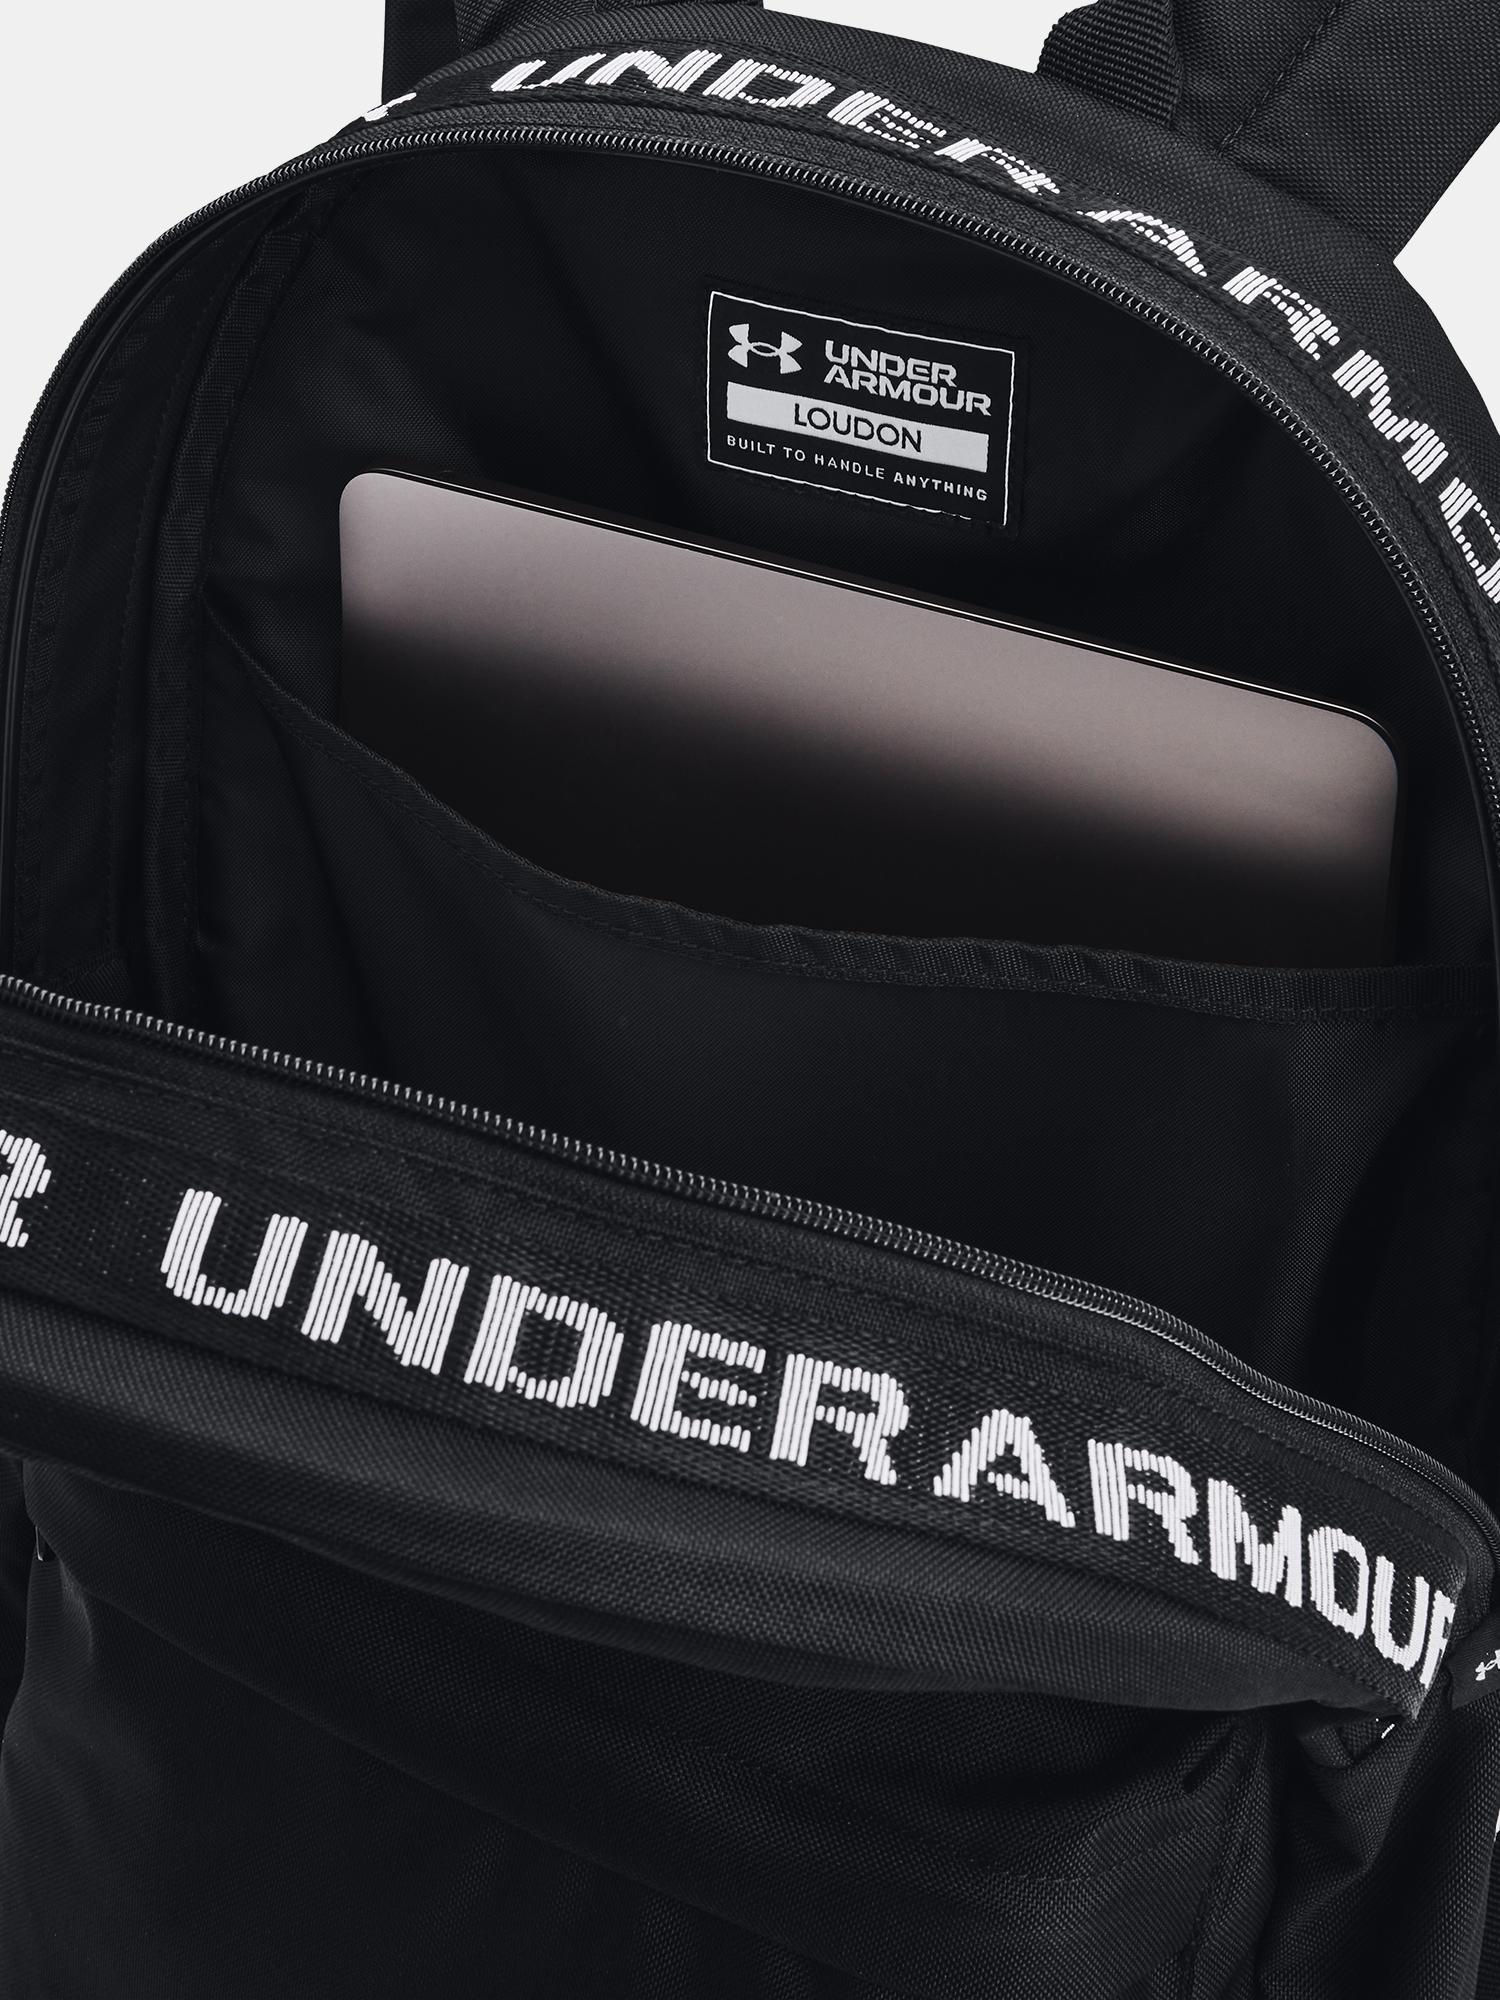 Under Armour Zaino donna nero